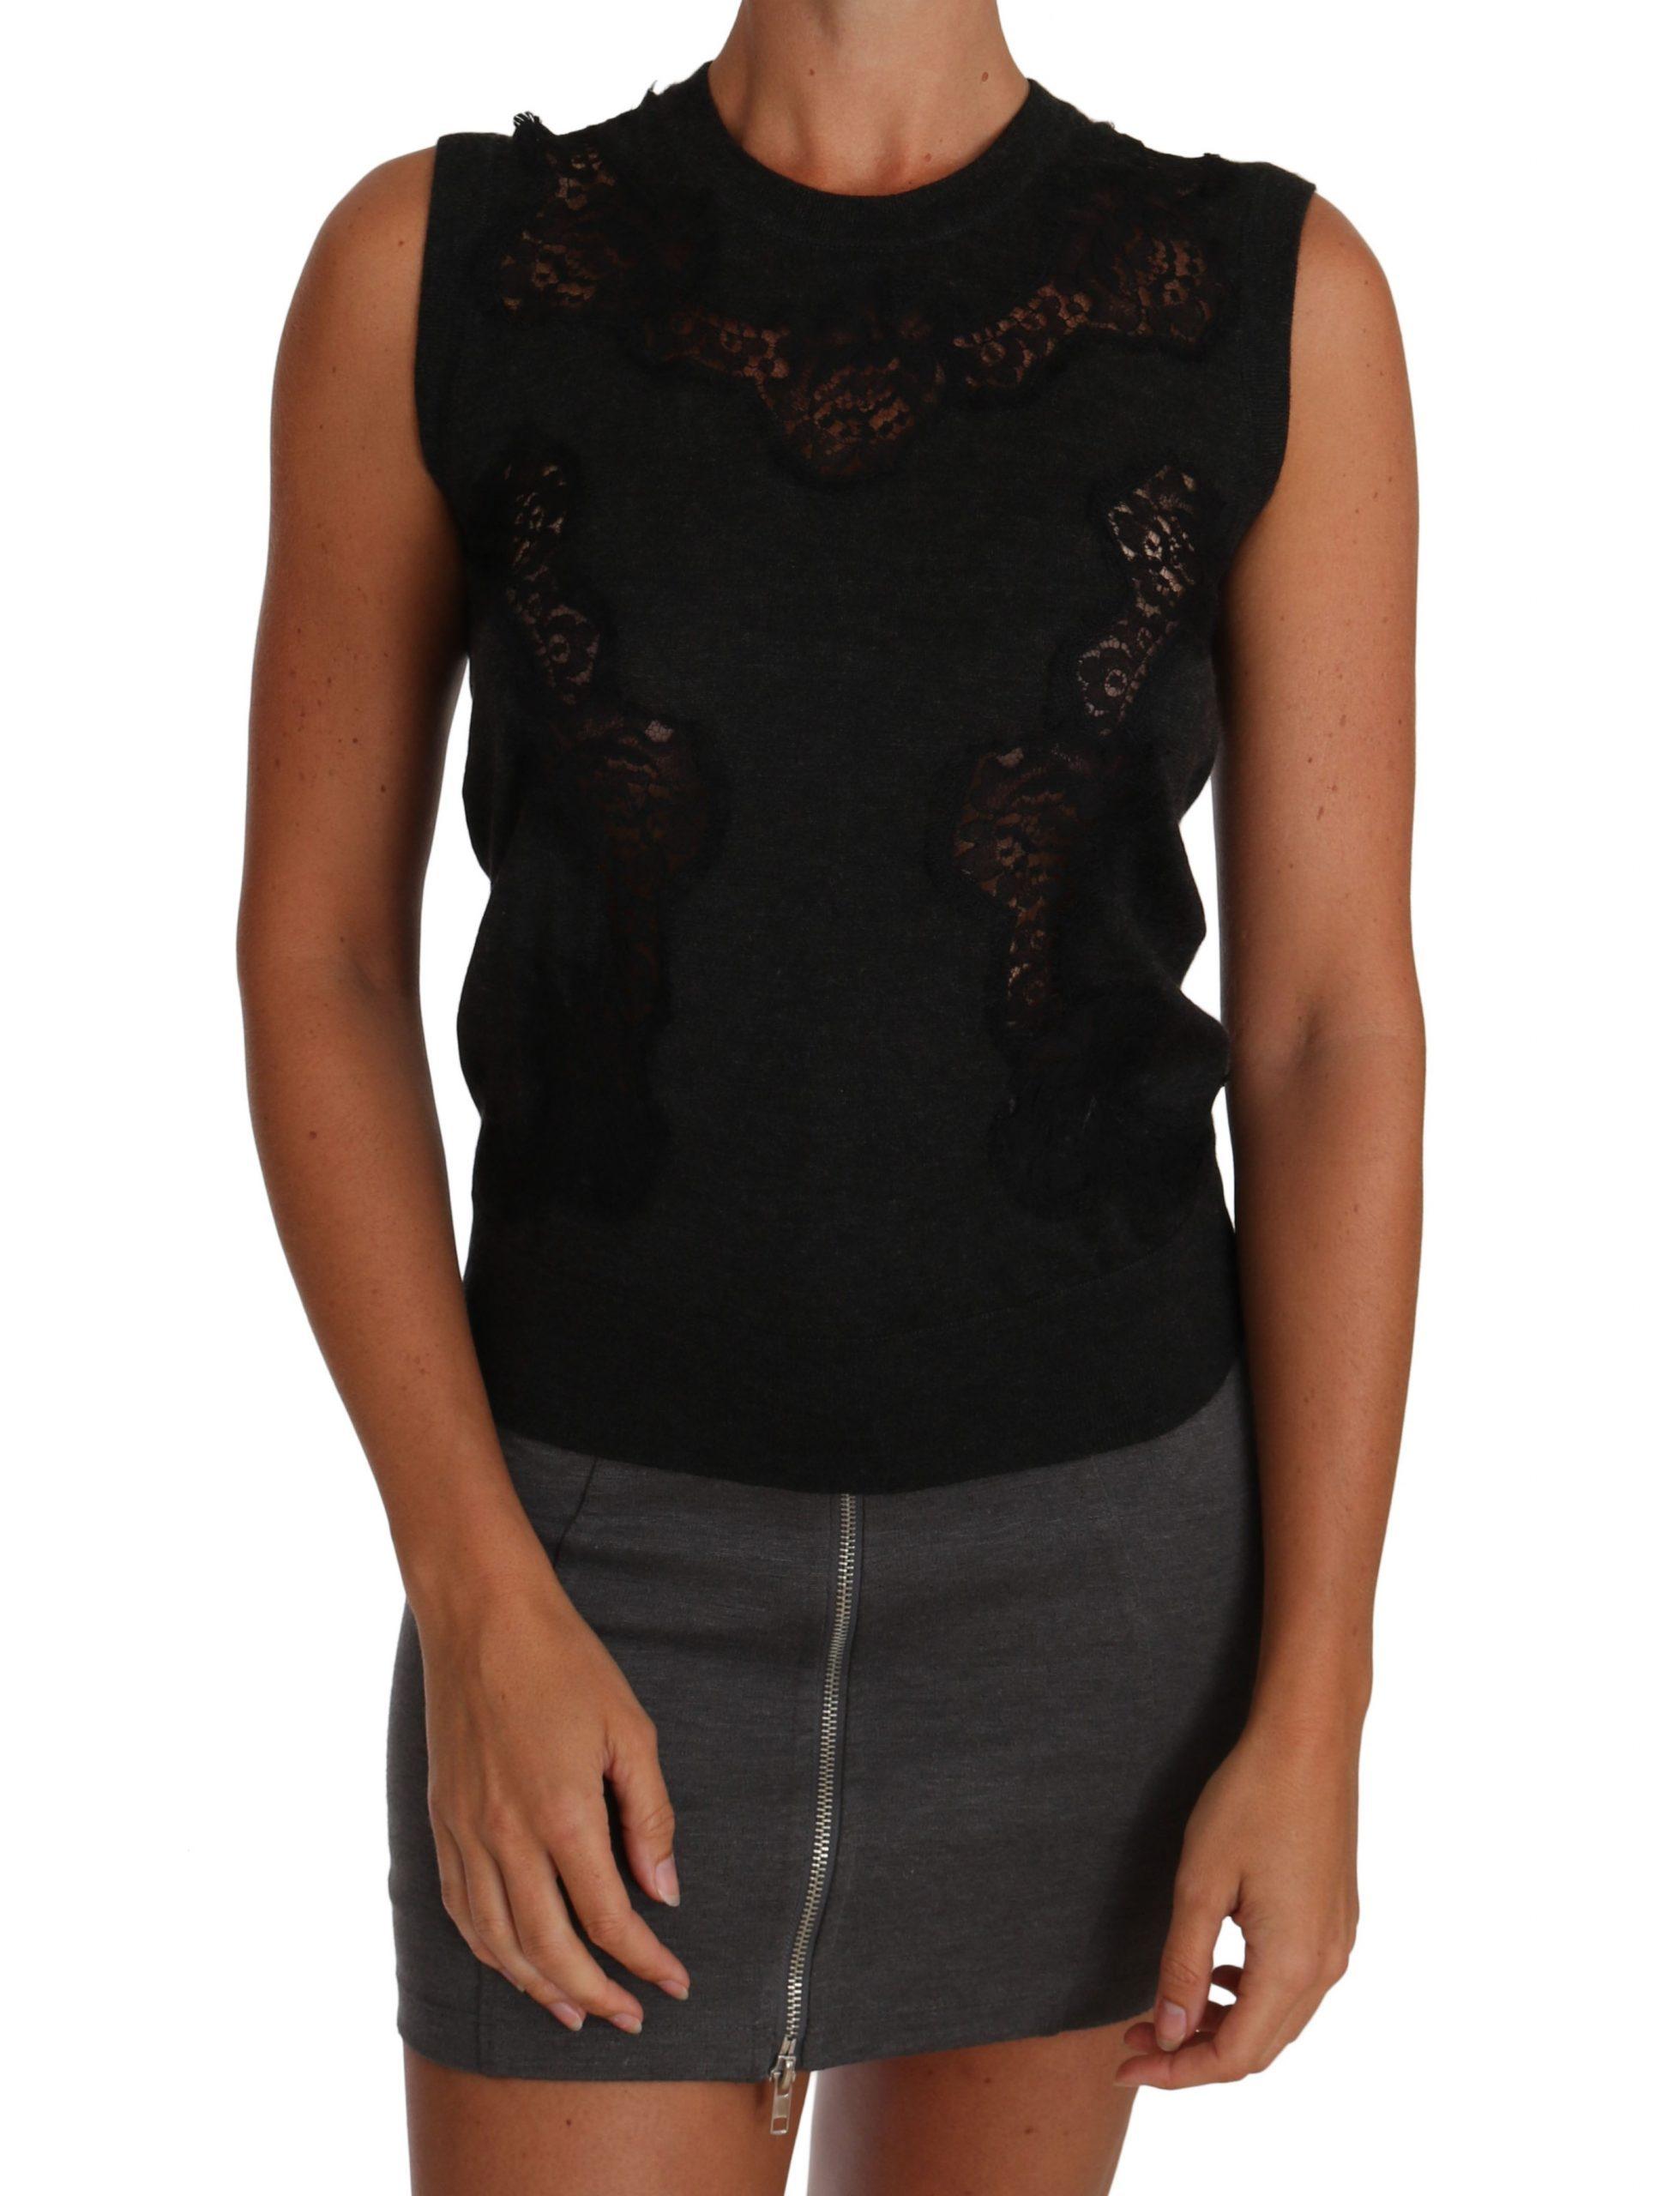 Dolce & Gabbana Women's Silk Cutout Tops Gray TSH2385 - IT40 S